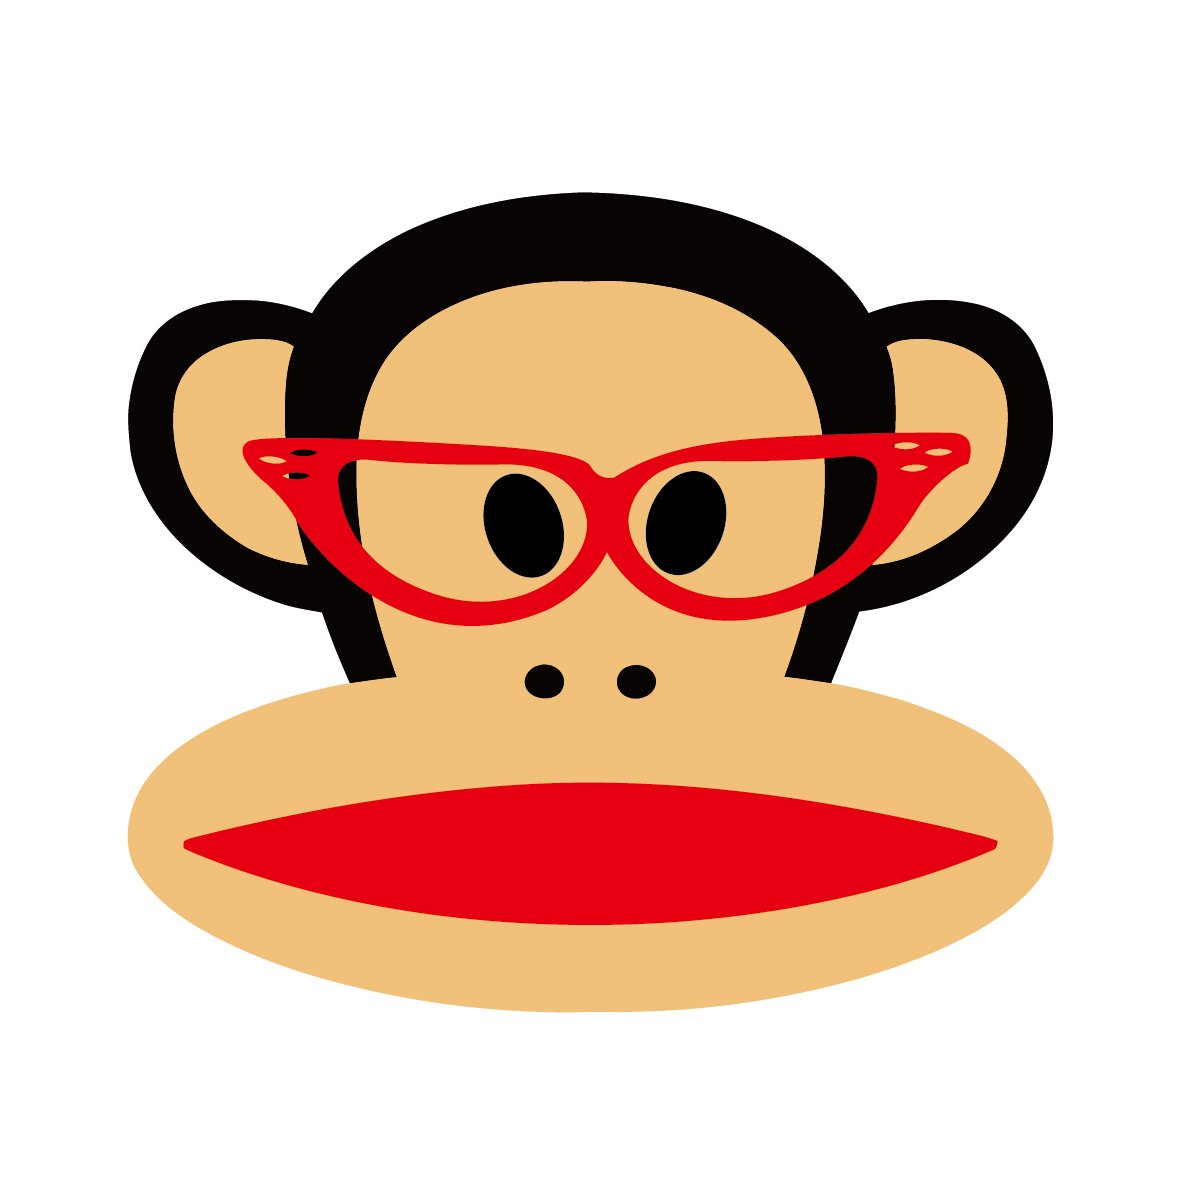 ky 卡艺 汽车贴纸 大嘴猴paulfrank 大嘴猴 头像 表情 搞笑可爱卡通